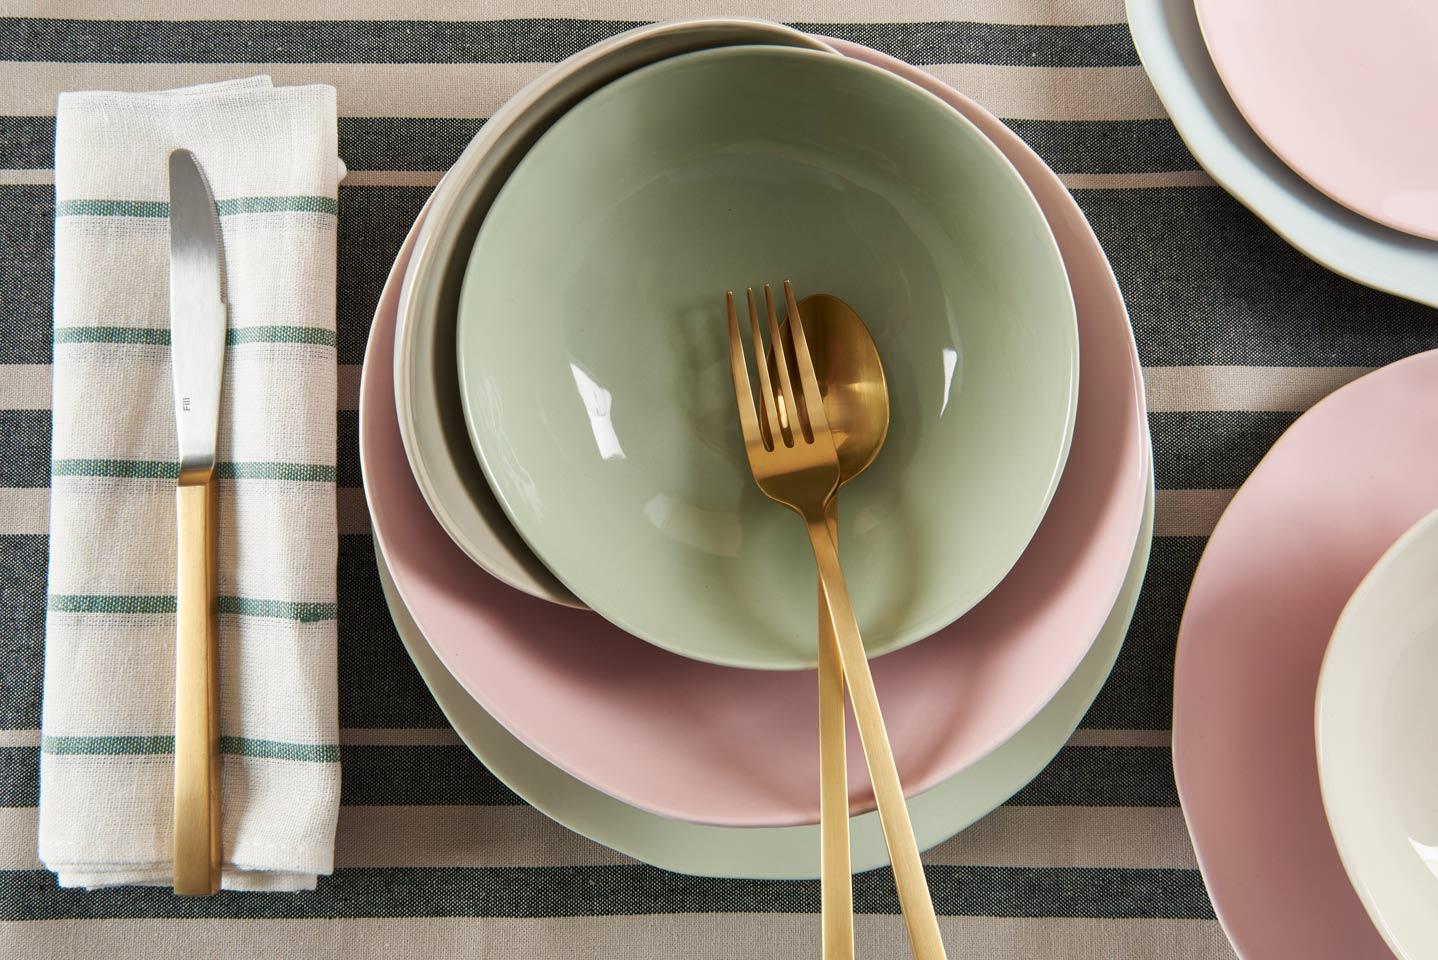 salvia salatschale keramikgeschirr in zartem pastell valeria gunz. Black Bedroom Furniture Sets. Home Design Ideas